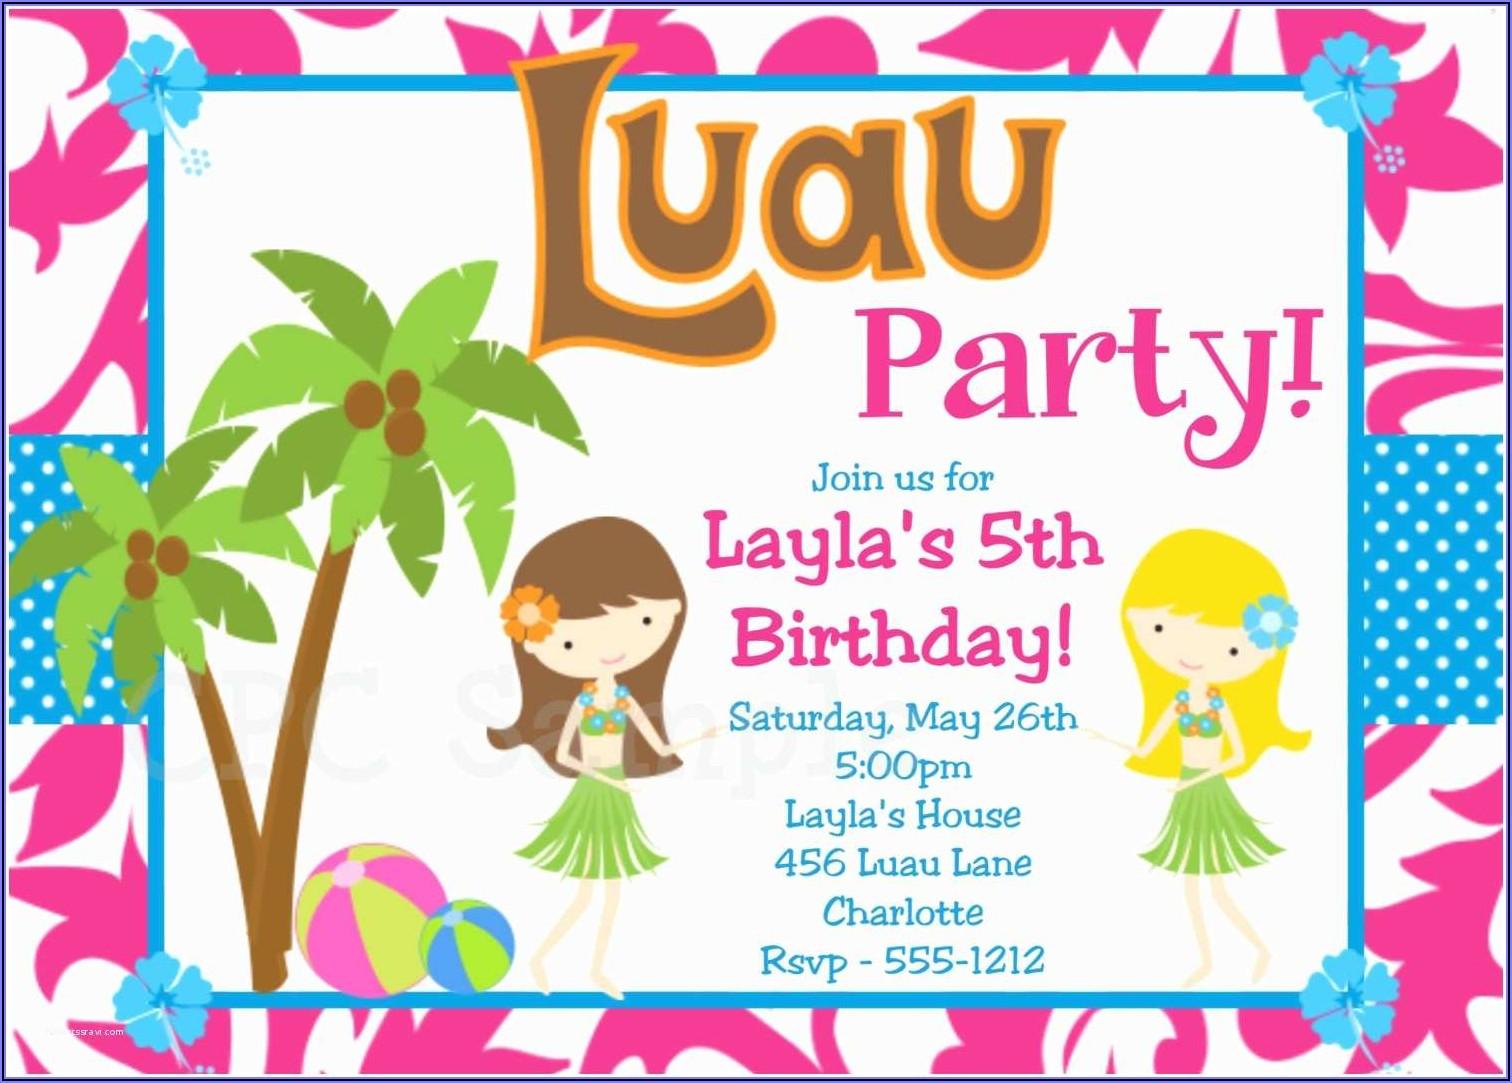 Luau Birthday Invitations Online